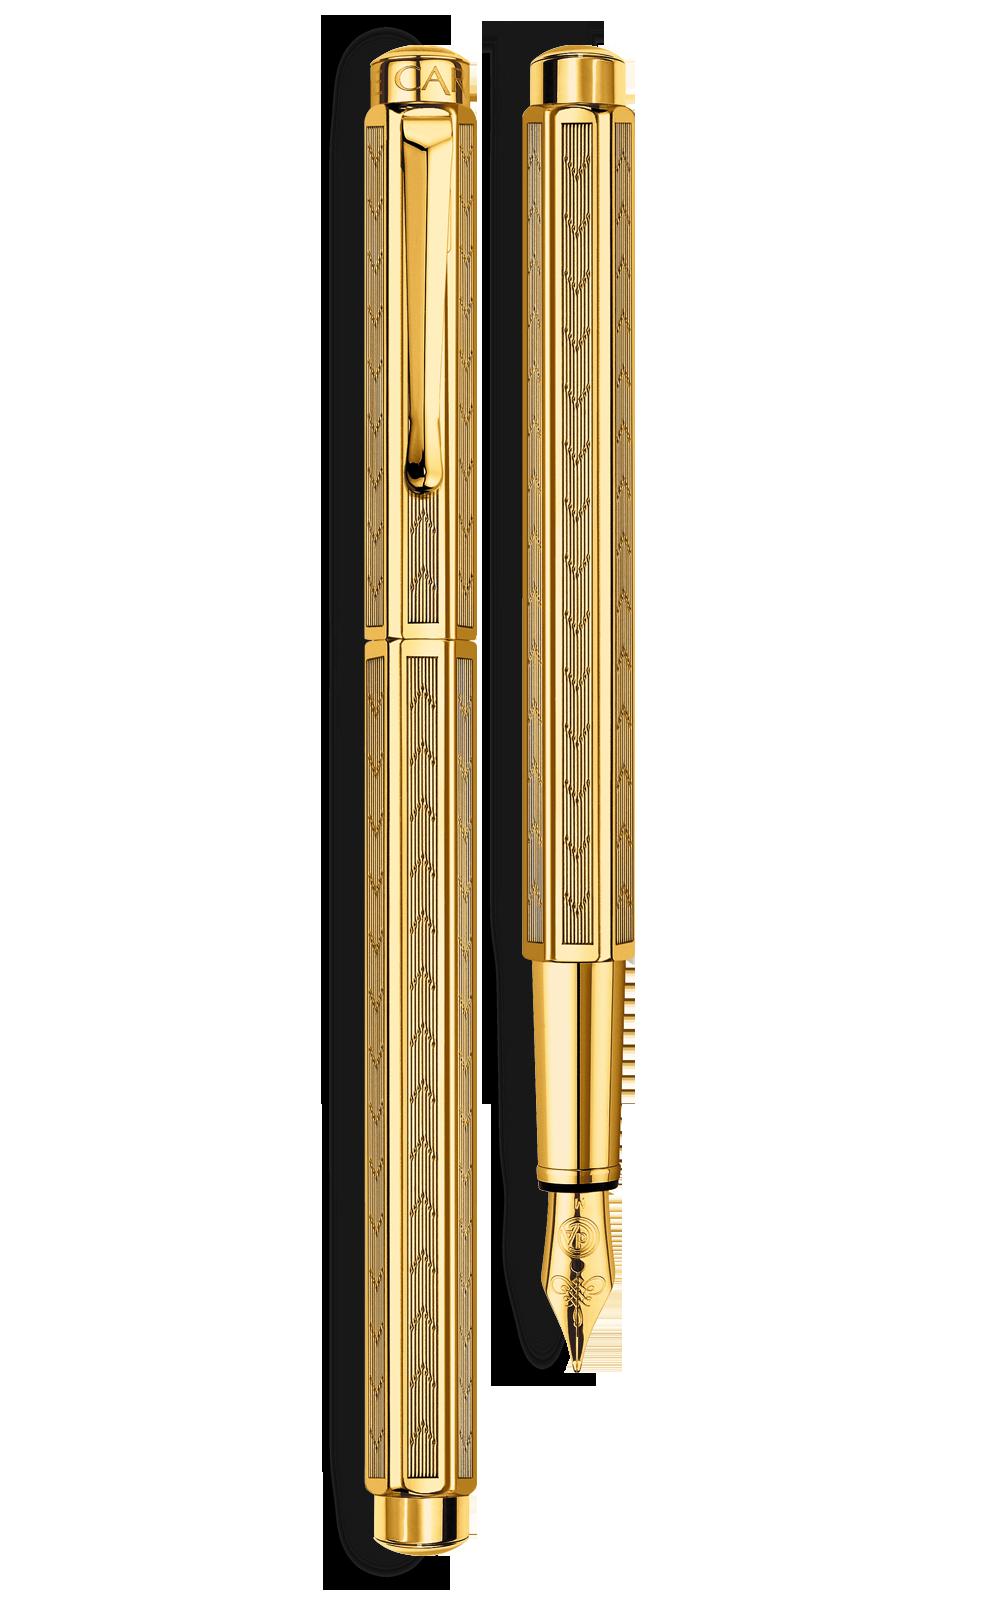 Bút máy ECRIDOR CHEVRON gold-plated